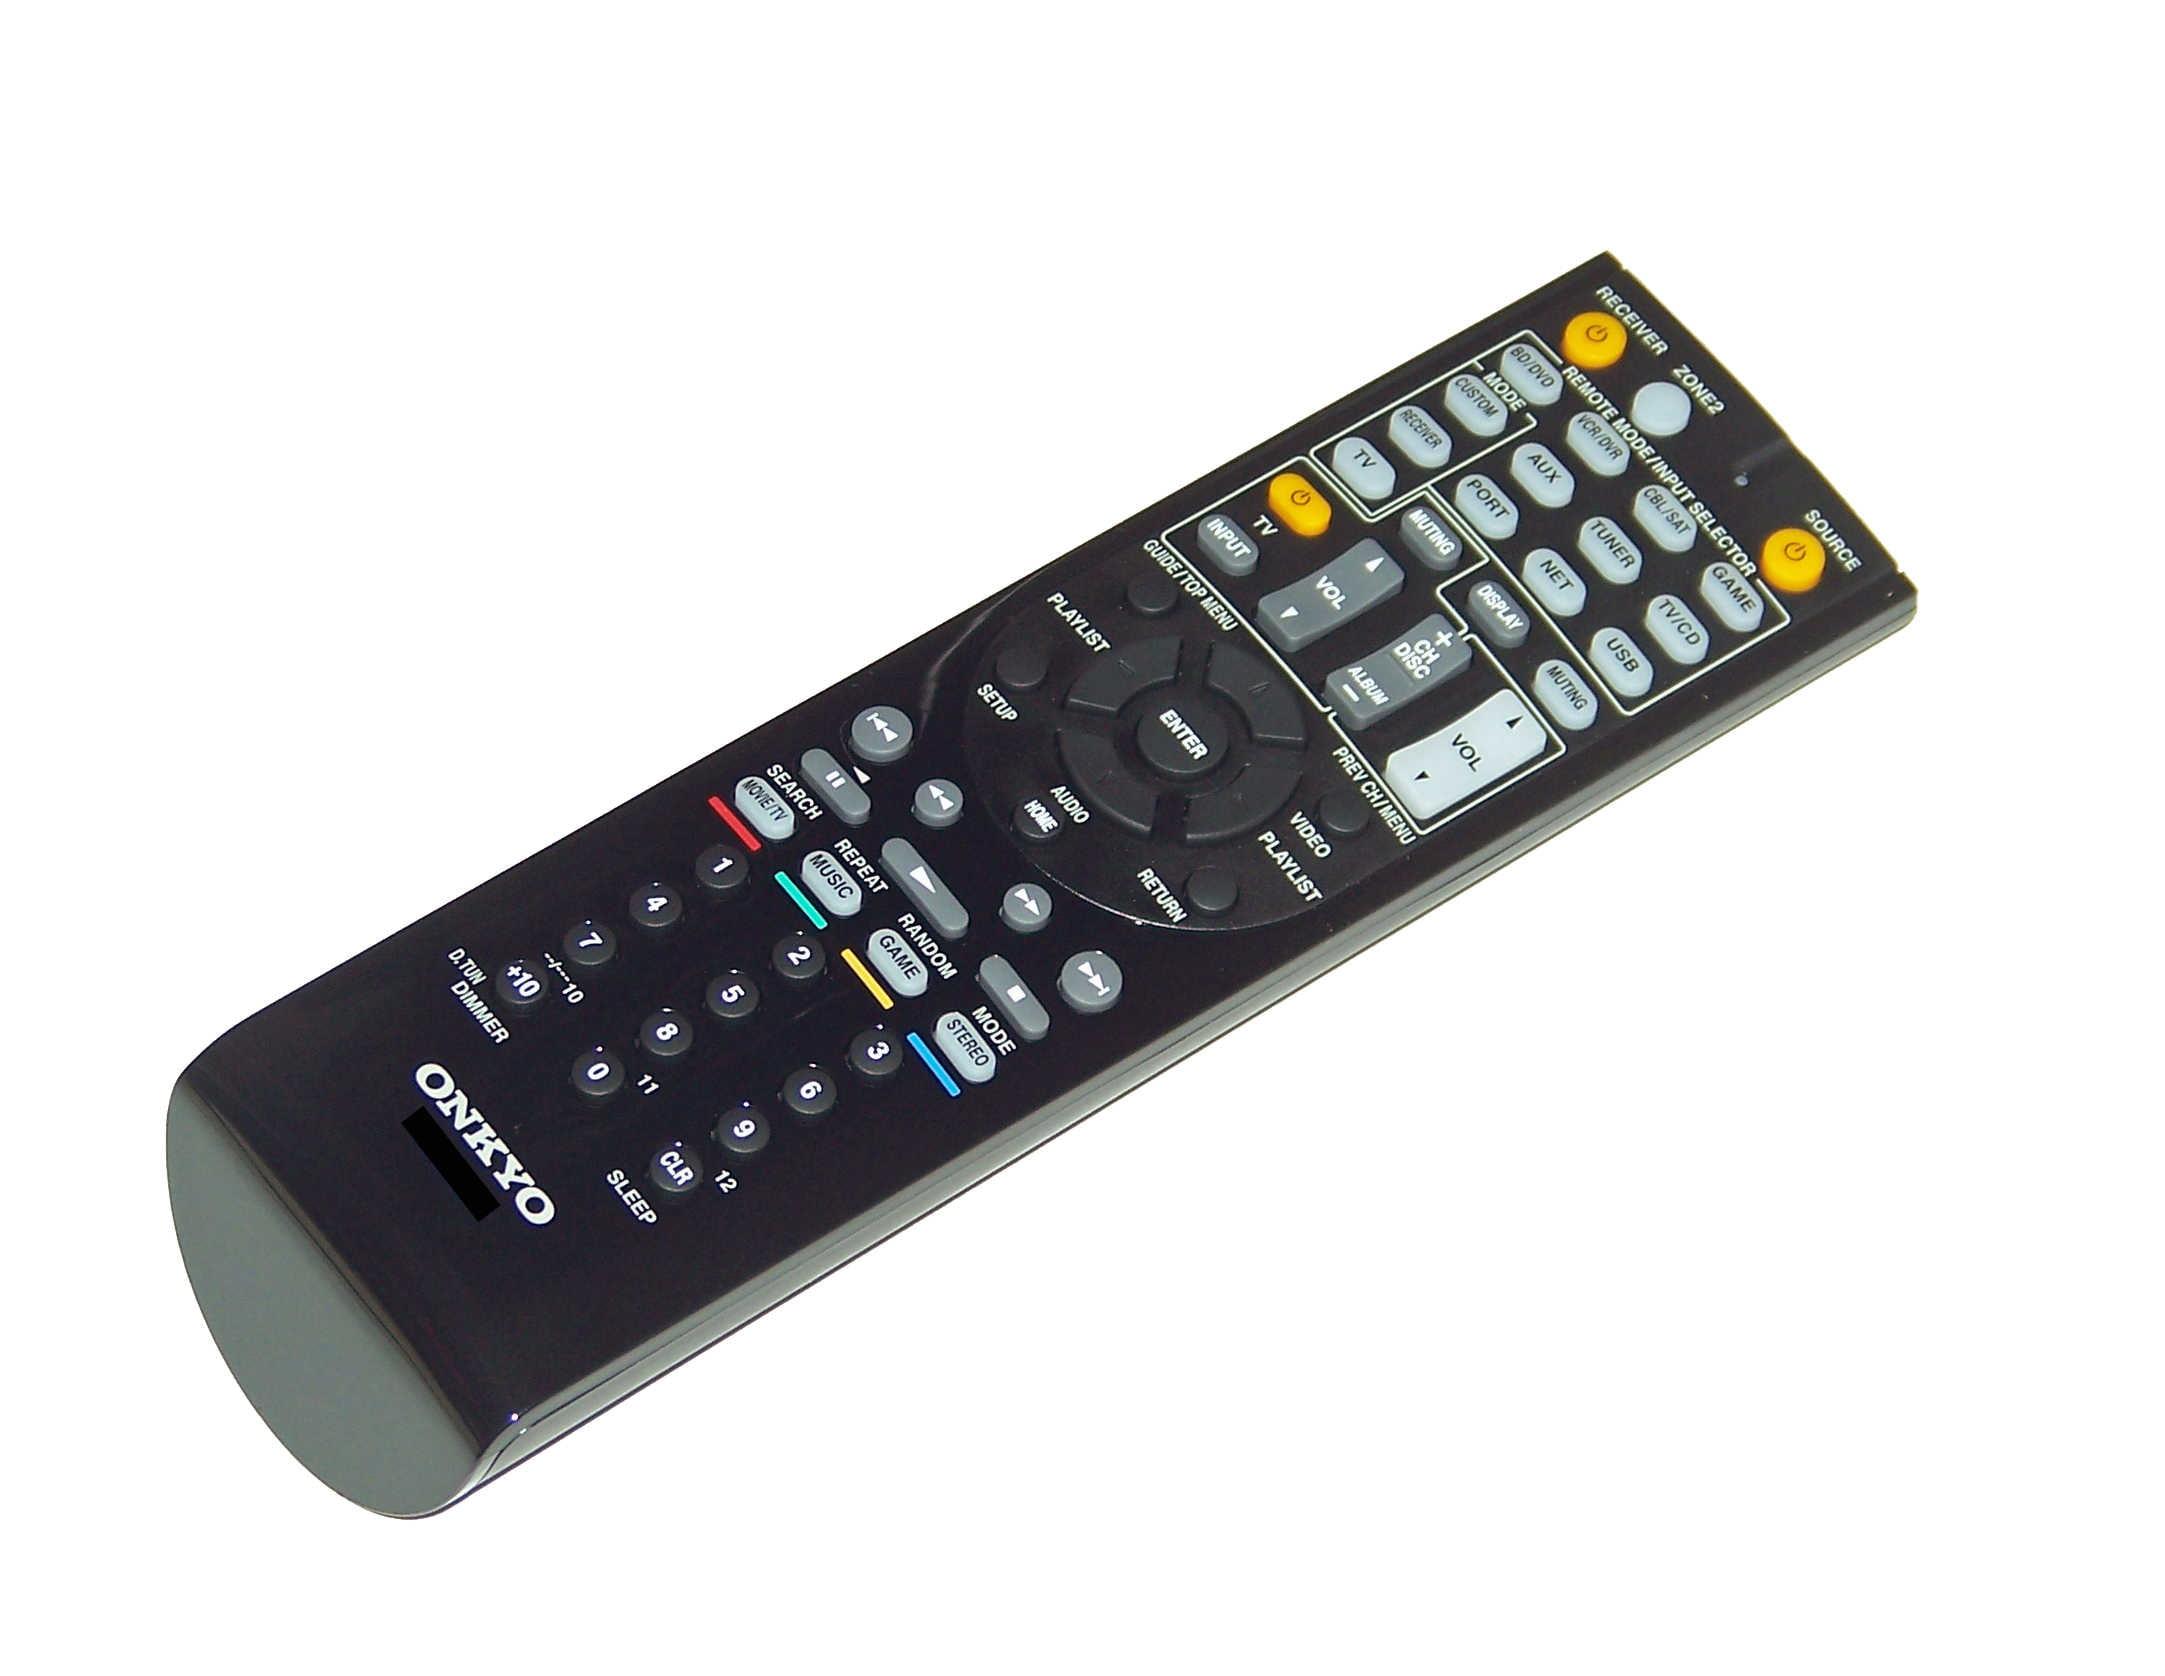 New OEM Onkyo Remote Control: HTR690, HT-R690, HTR990, HT-R990, HTRC360, HT-RC360 Read... by Onkyo